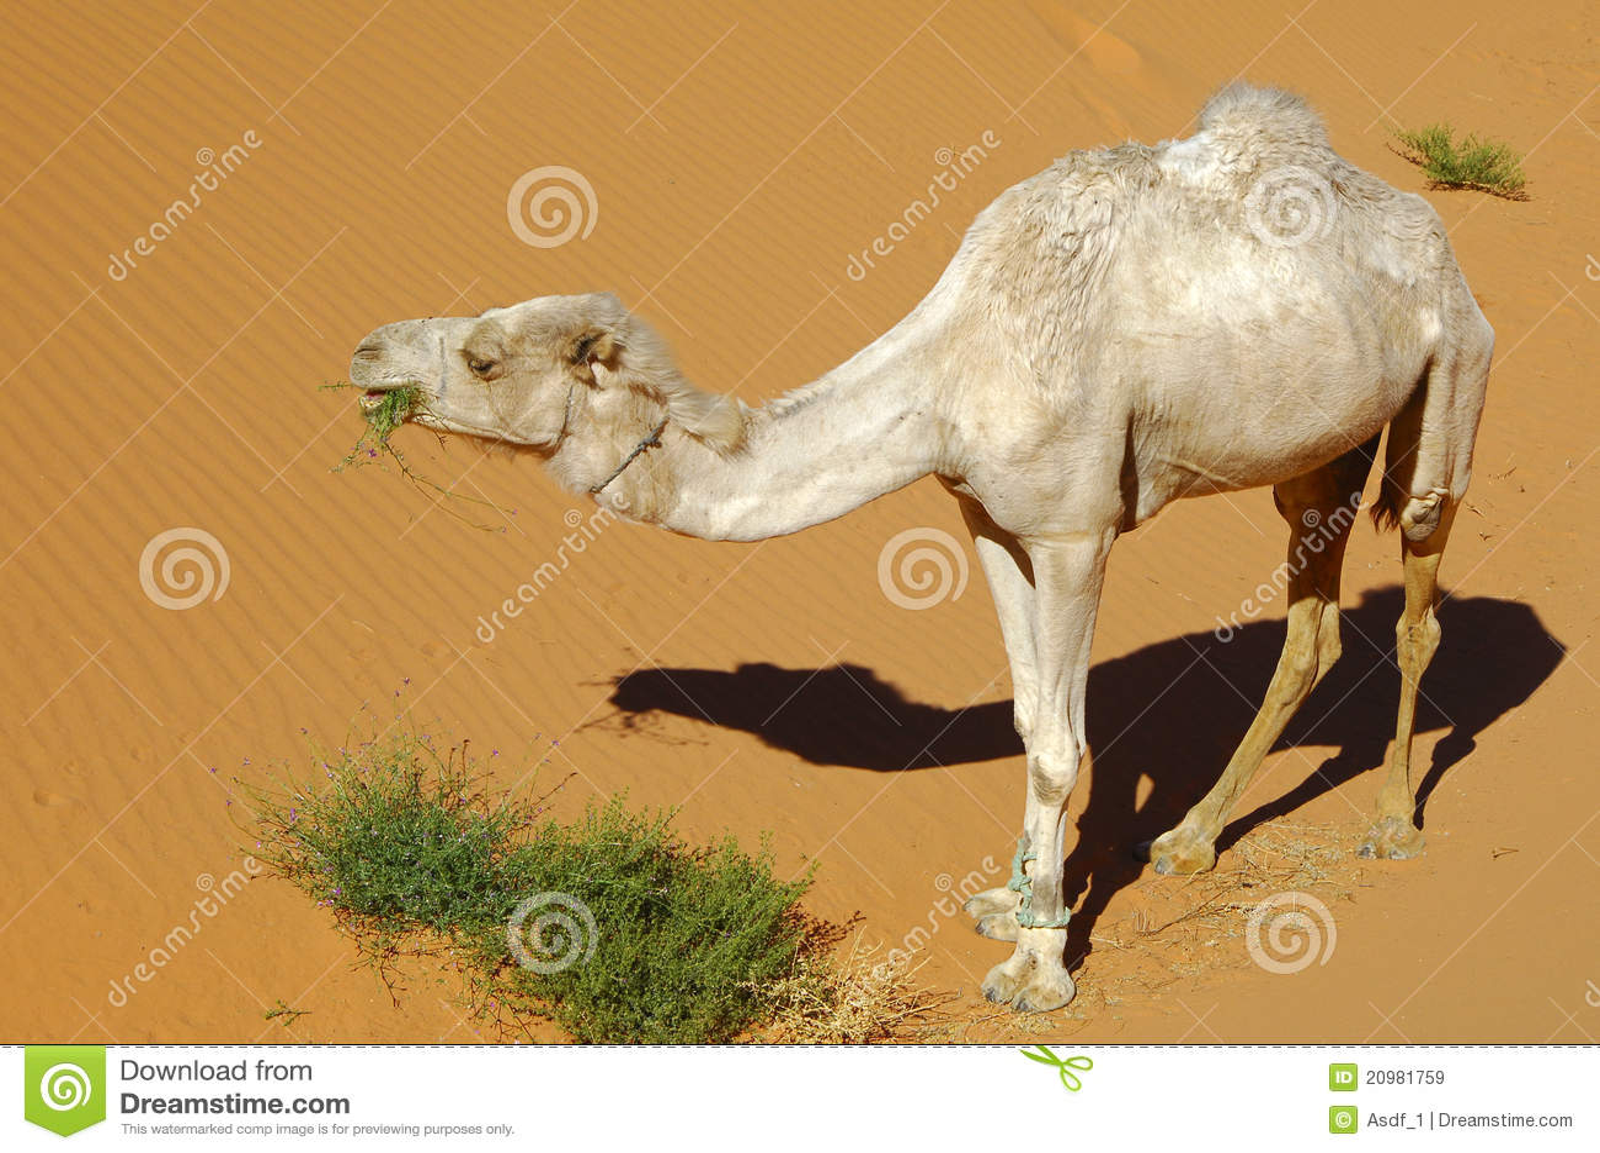 Hungriger Dromedary in der Wüste